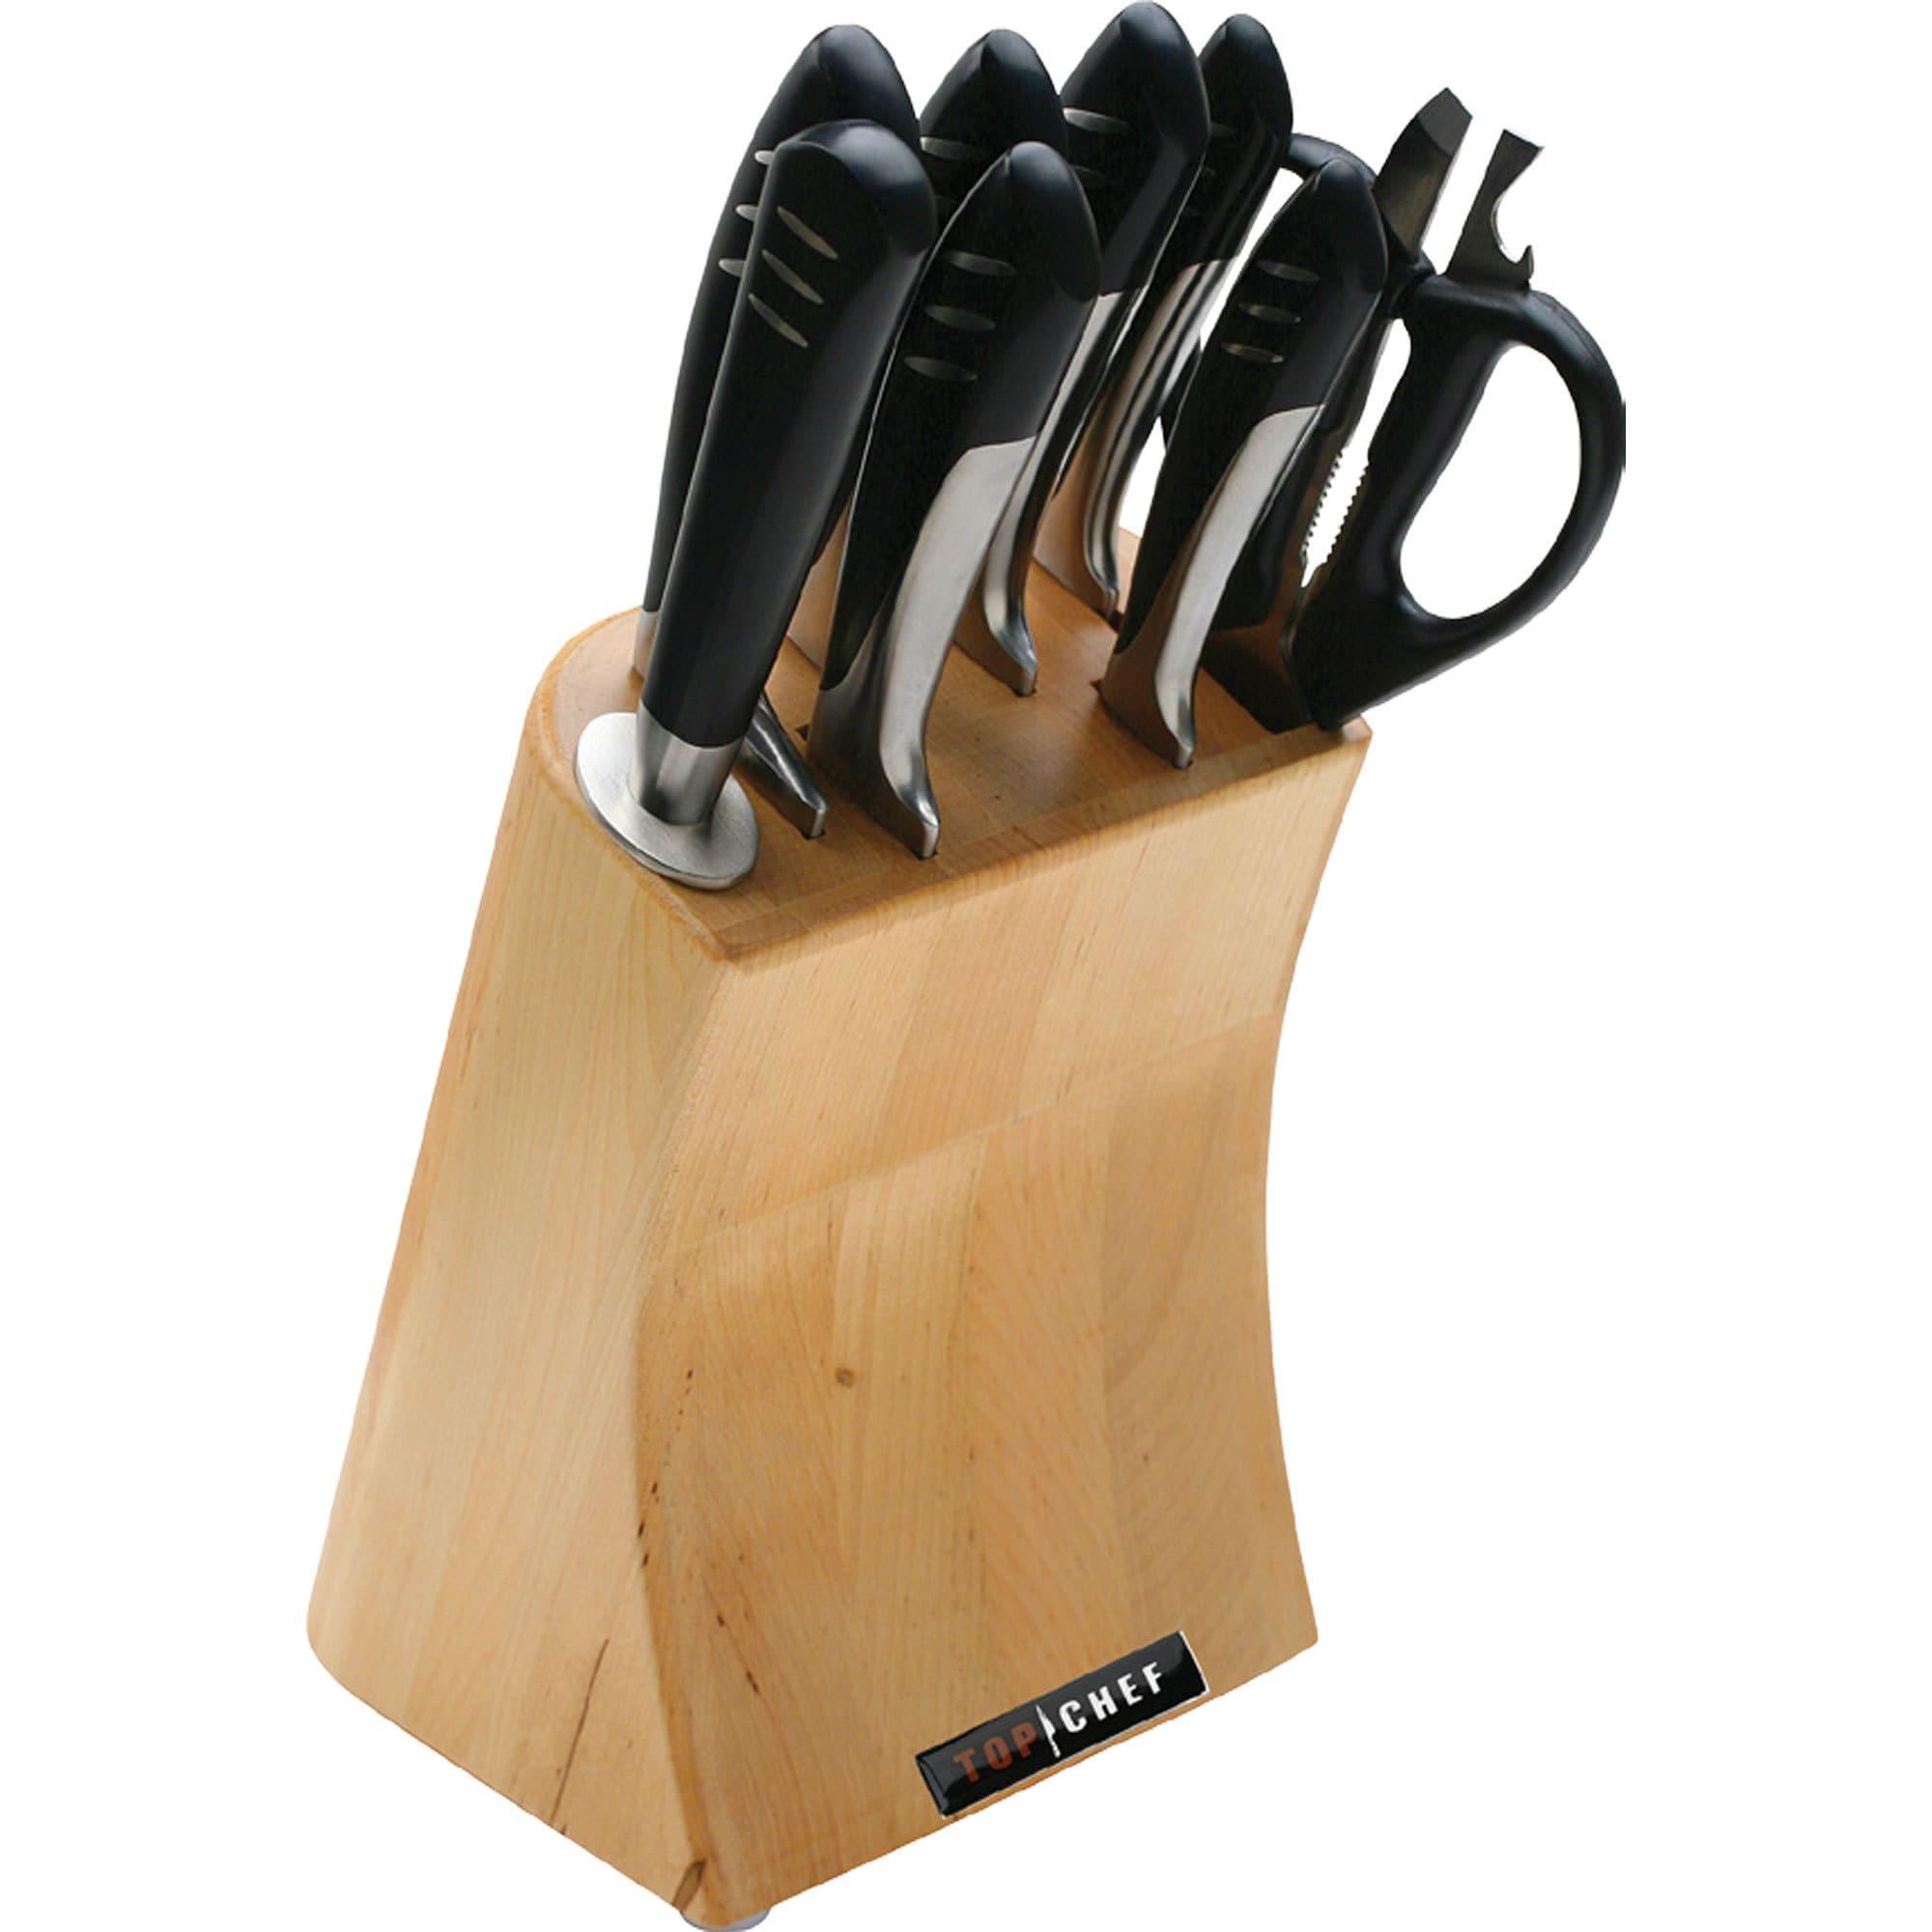 Knife block set